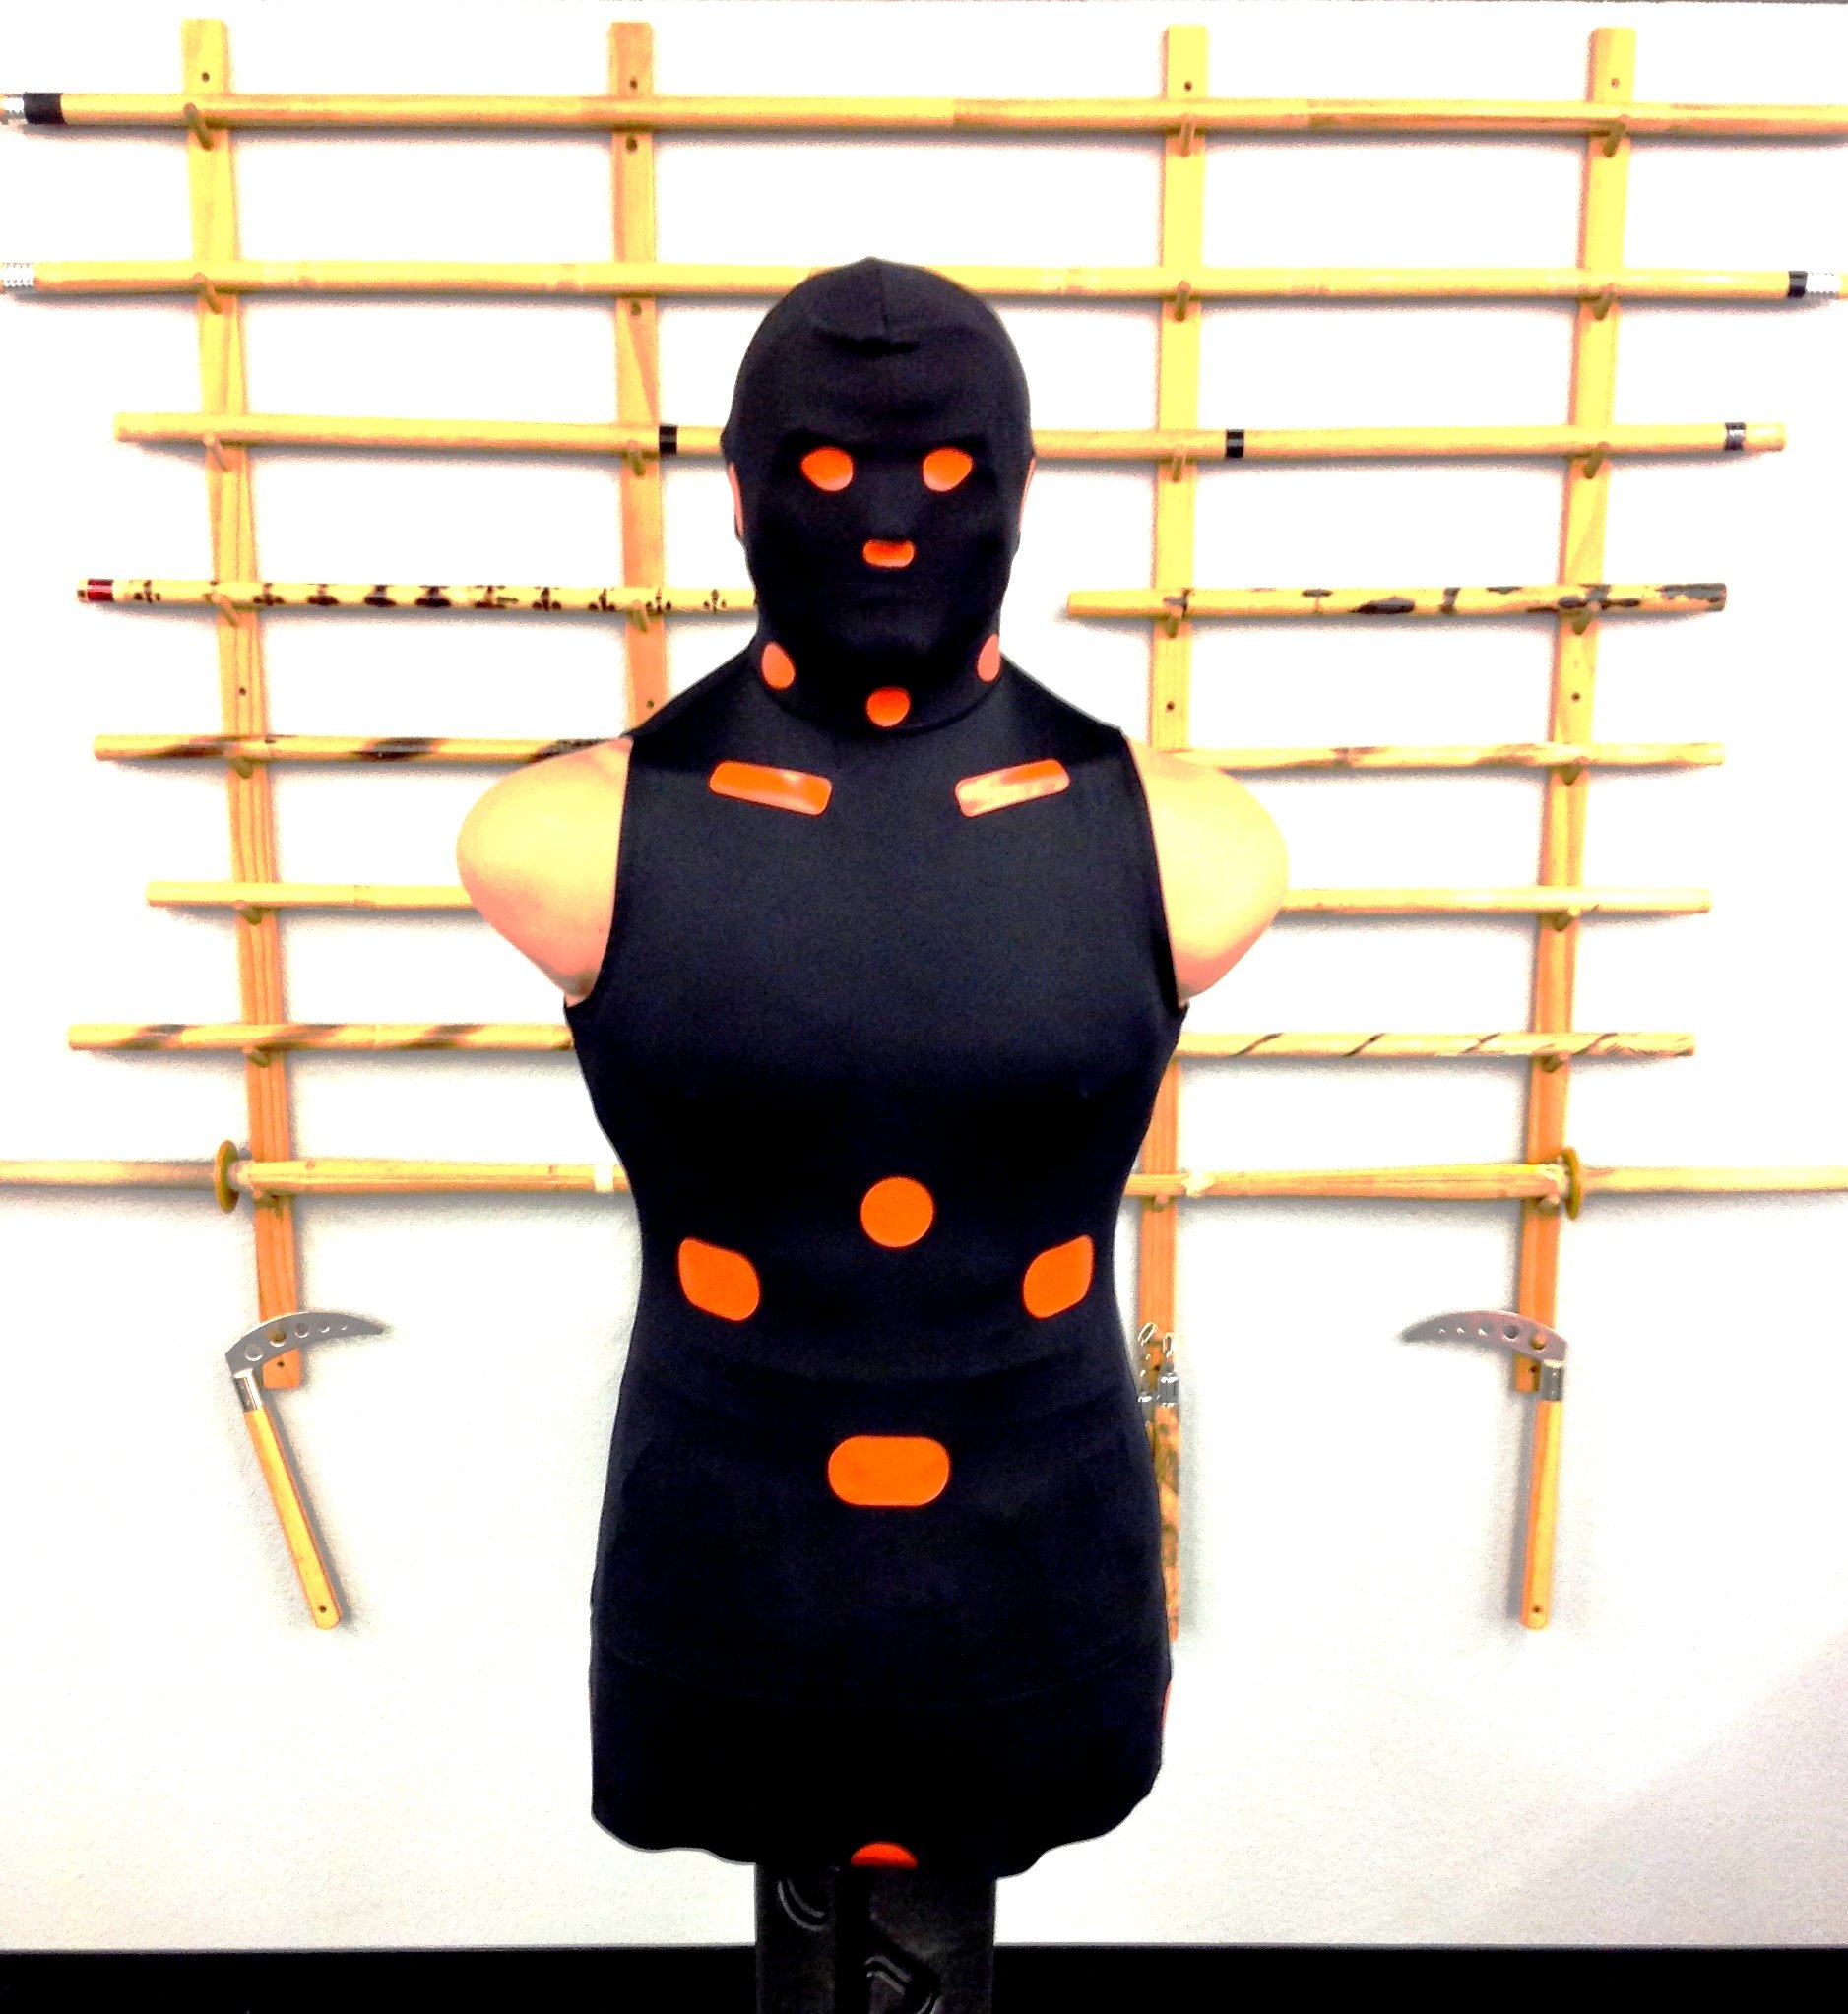 Strike-Skin Self Defense Training Aide ***BOB Punching Bag NOT Included by Strike-Skin (Image #2)